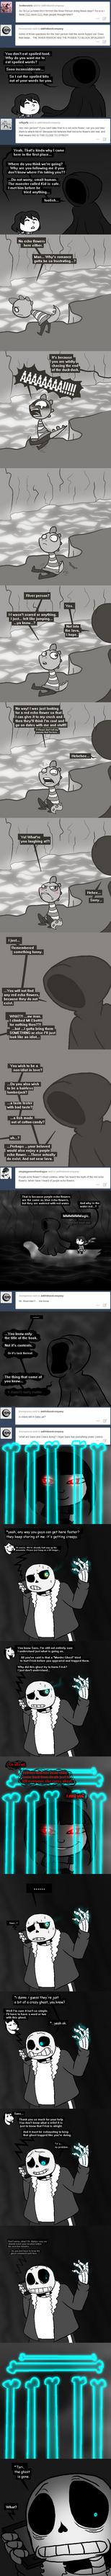 AskFriskAndCo 26: Ghosts by Retaya